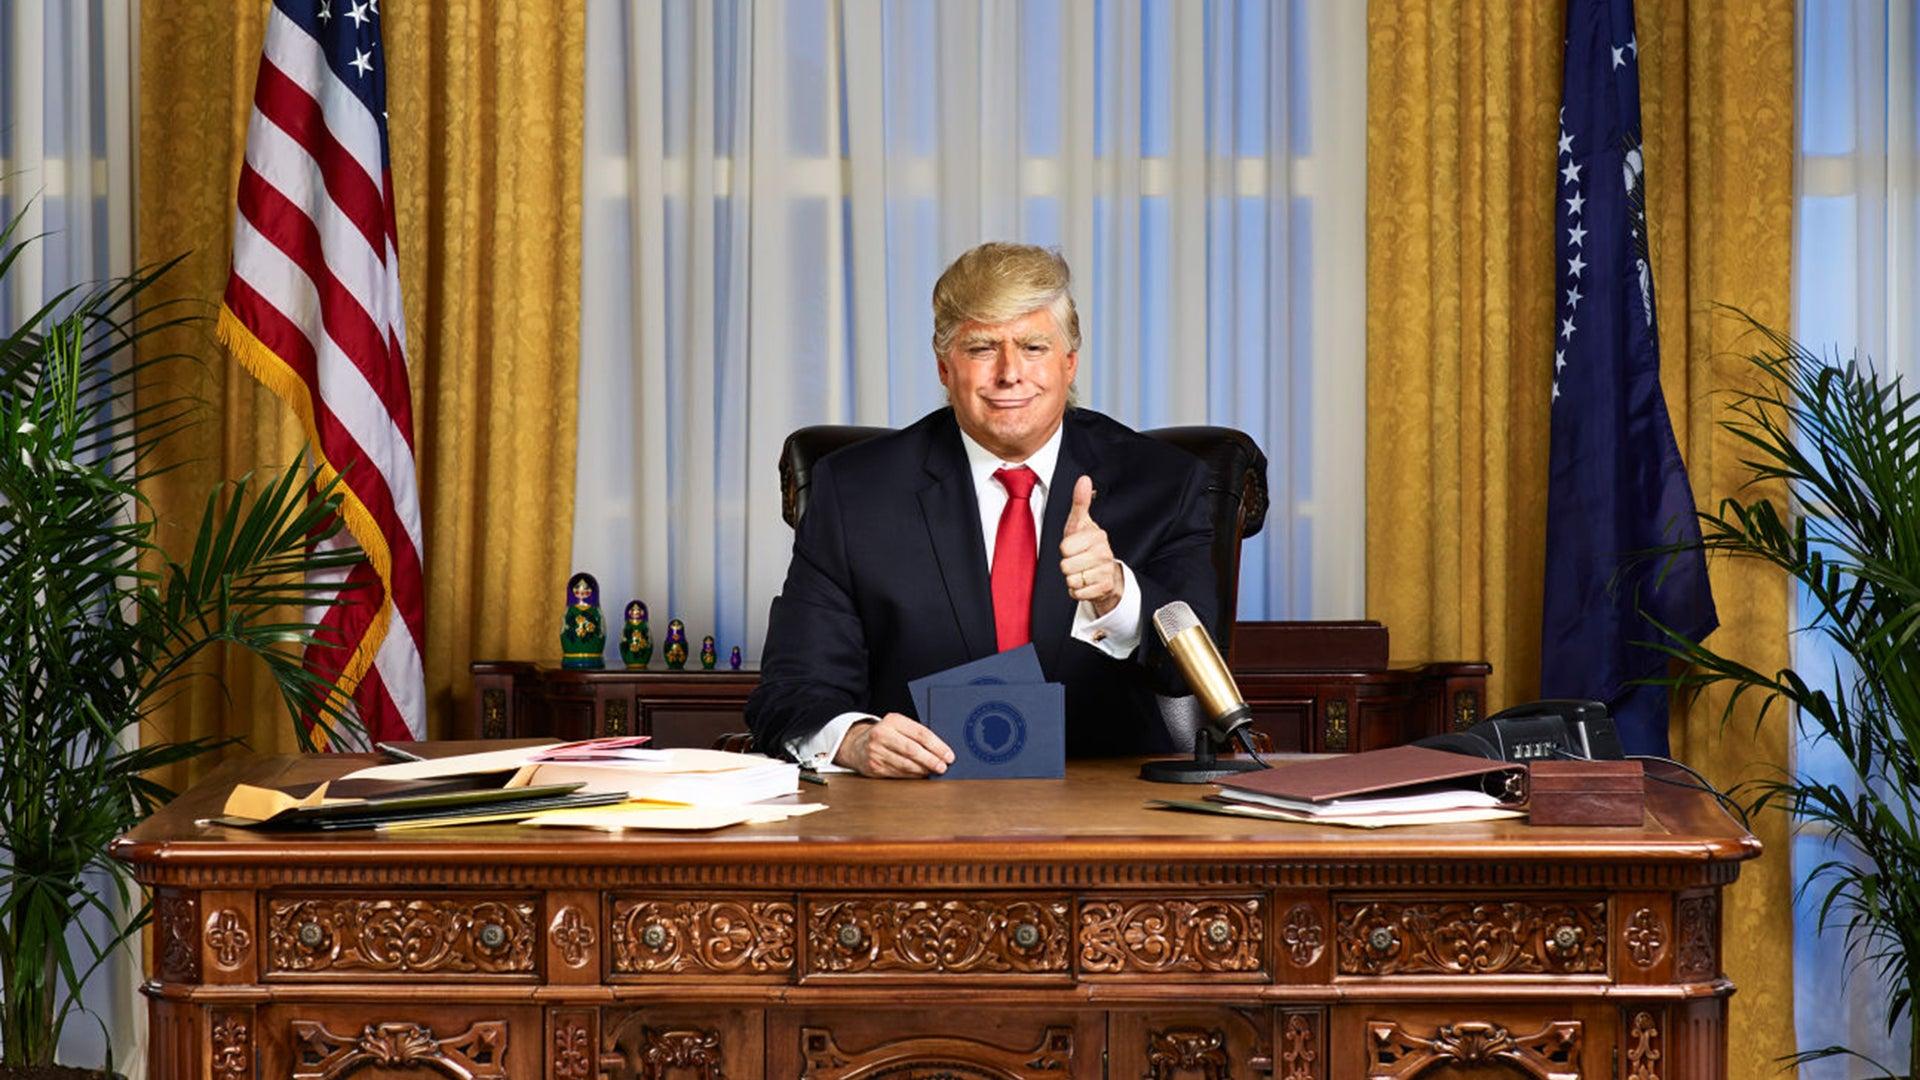 Anthony Atamanuik, The President Show